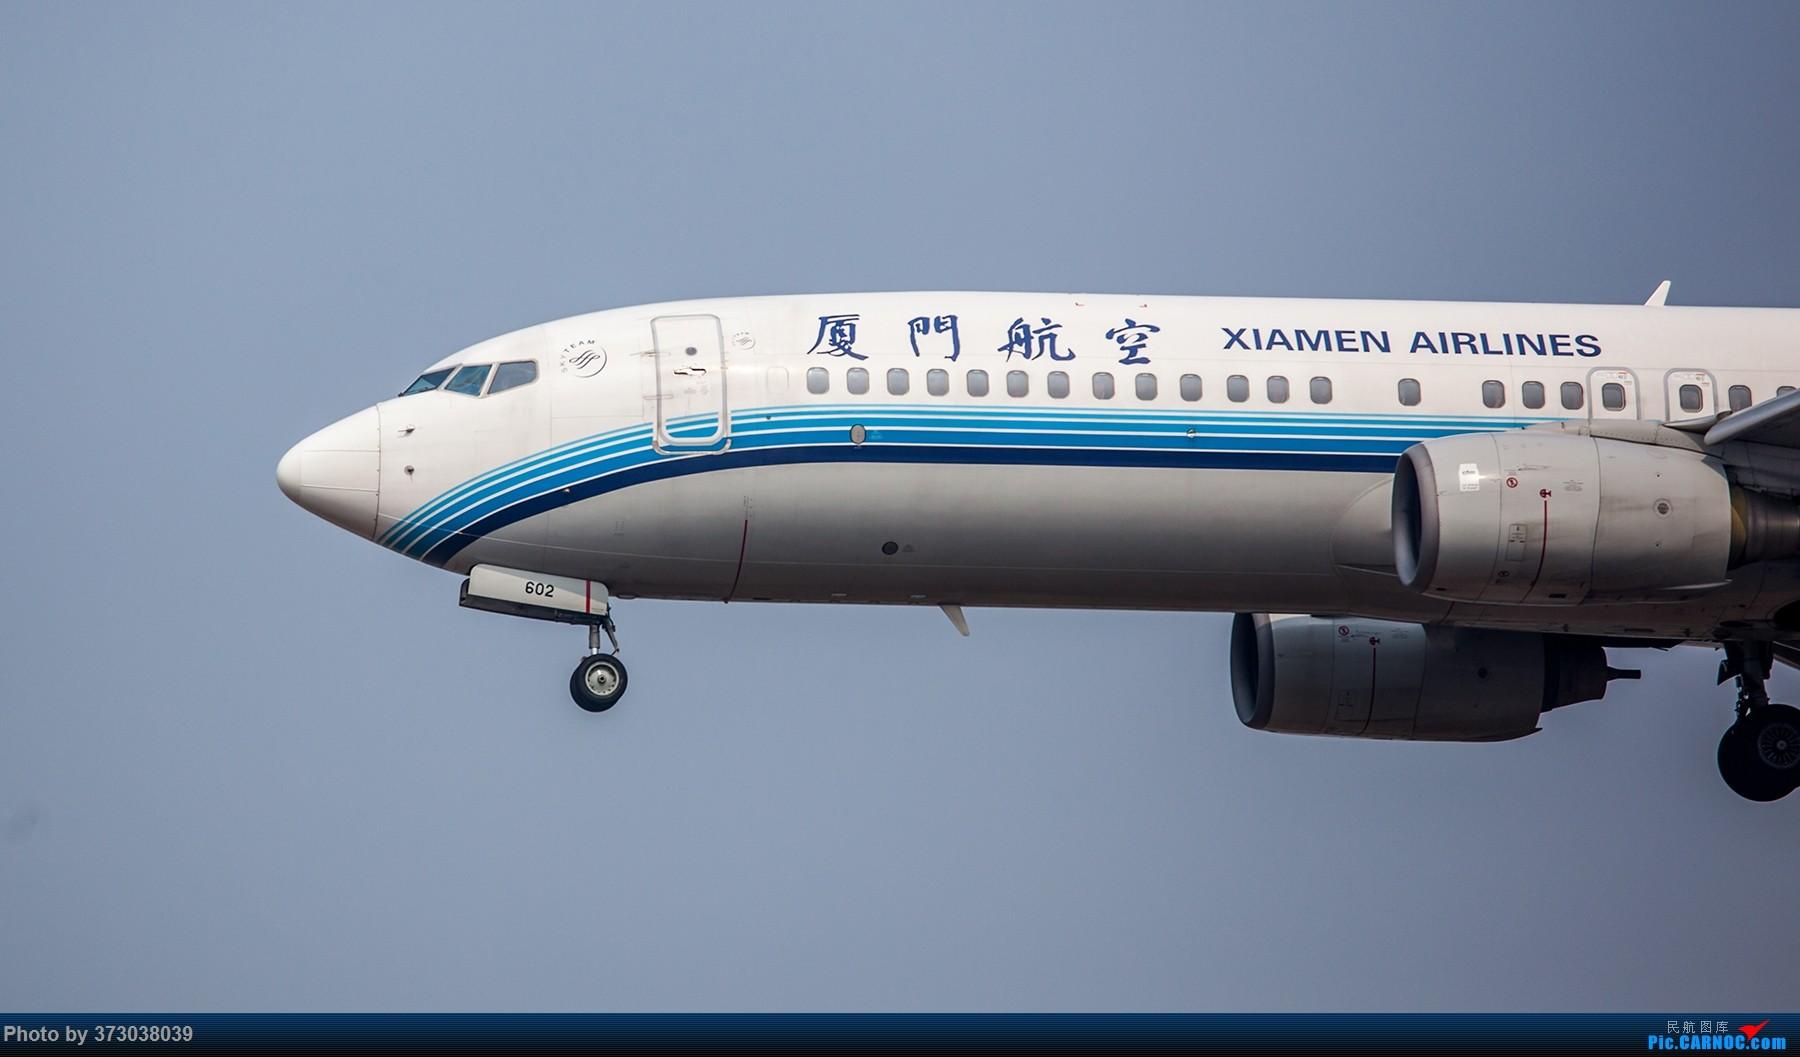 Re:[原创]【杭州飞友会】A320Neo迪士尼杭州萧山机场拍机班门弄斧记 BOEING 737-800 B-5602 中国杭州萧山国际机场